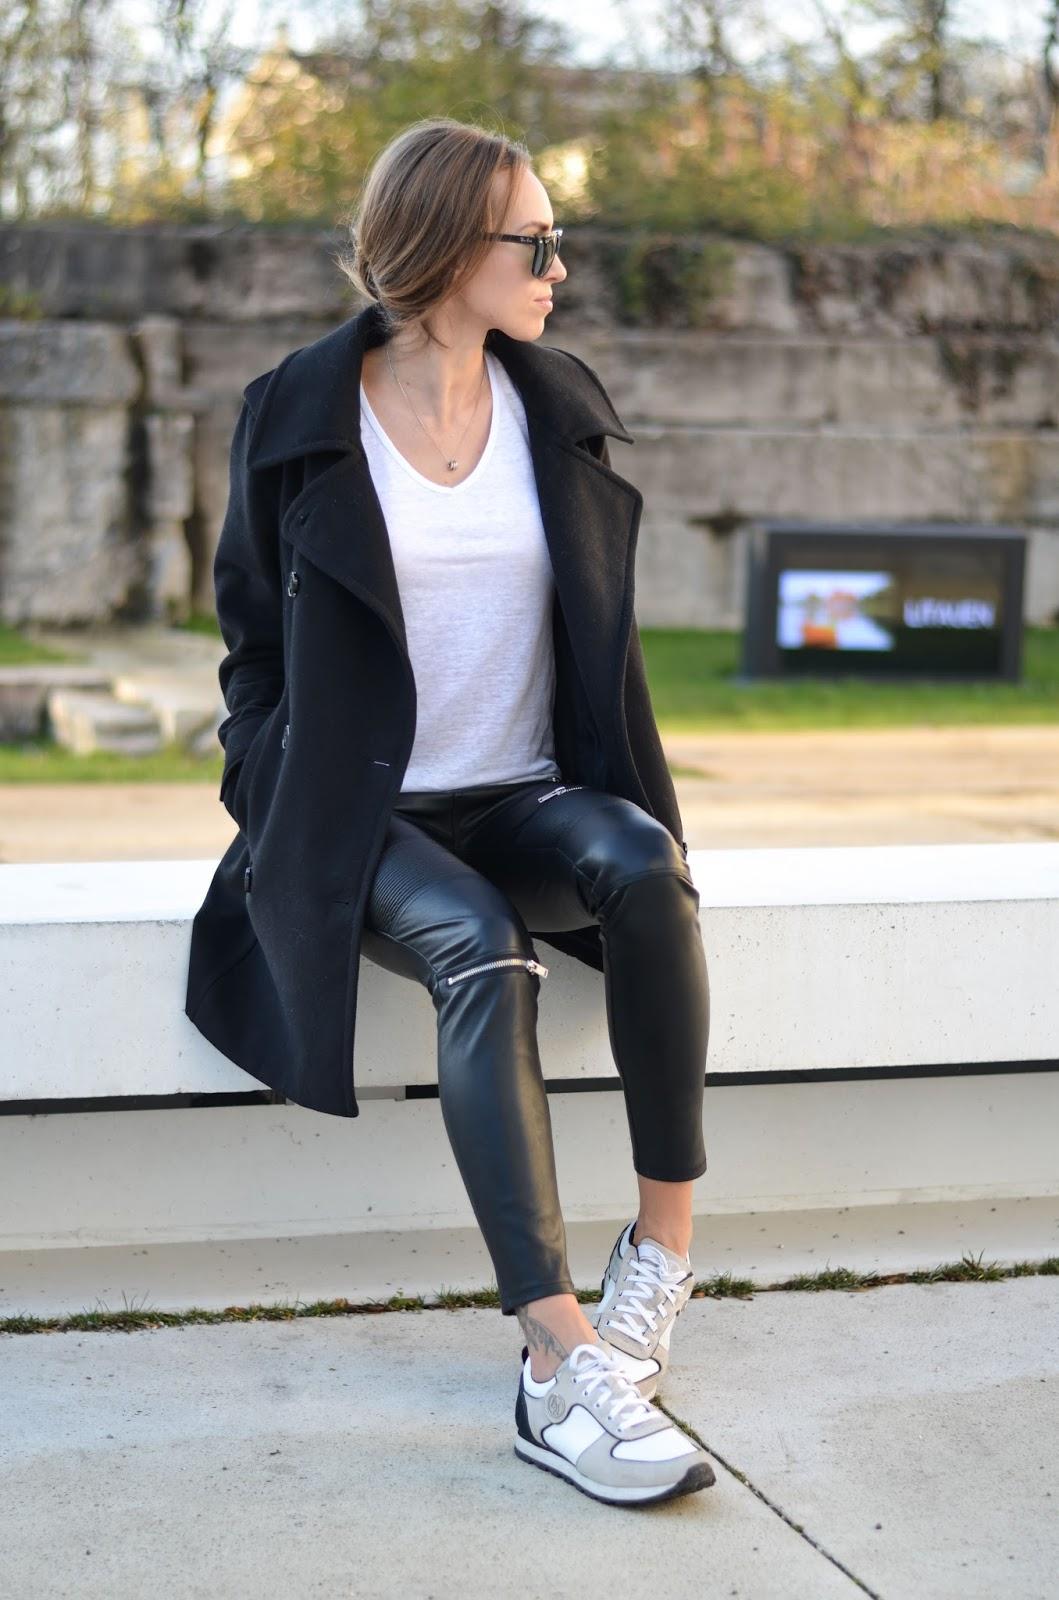 kristjaana mere black peacoat leather pants white sneakers winter outfit